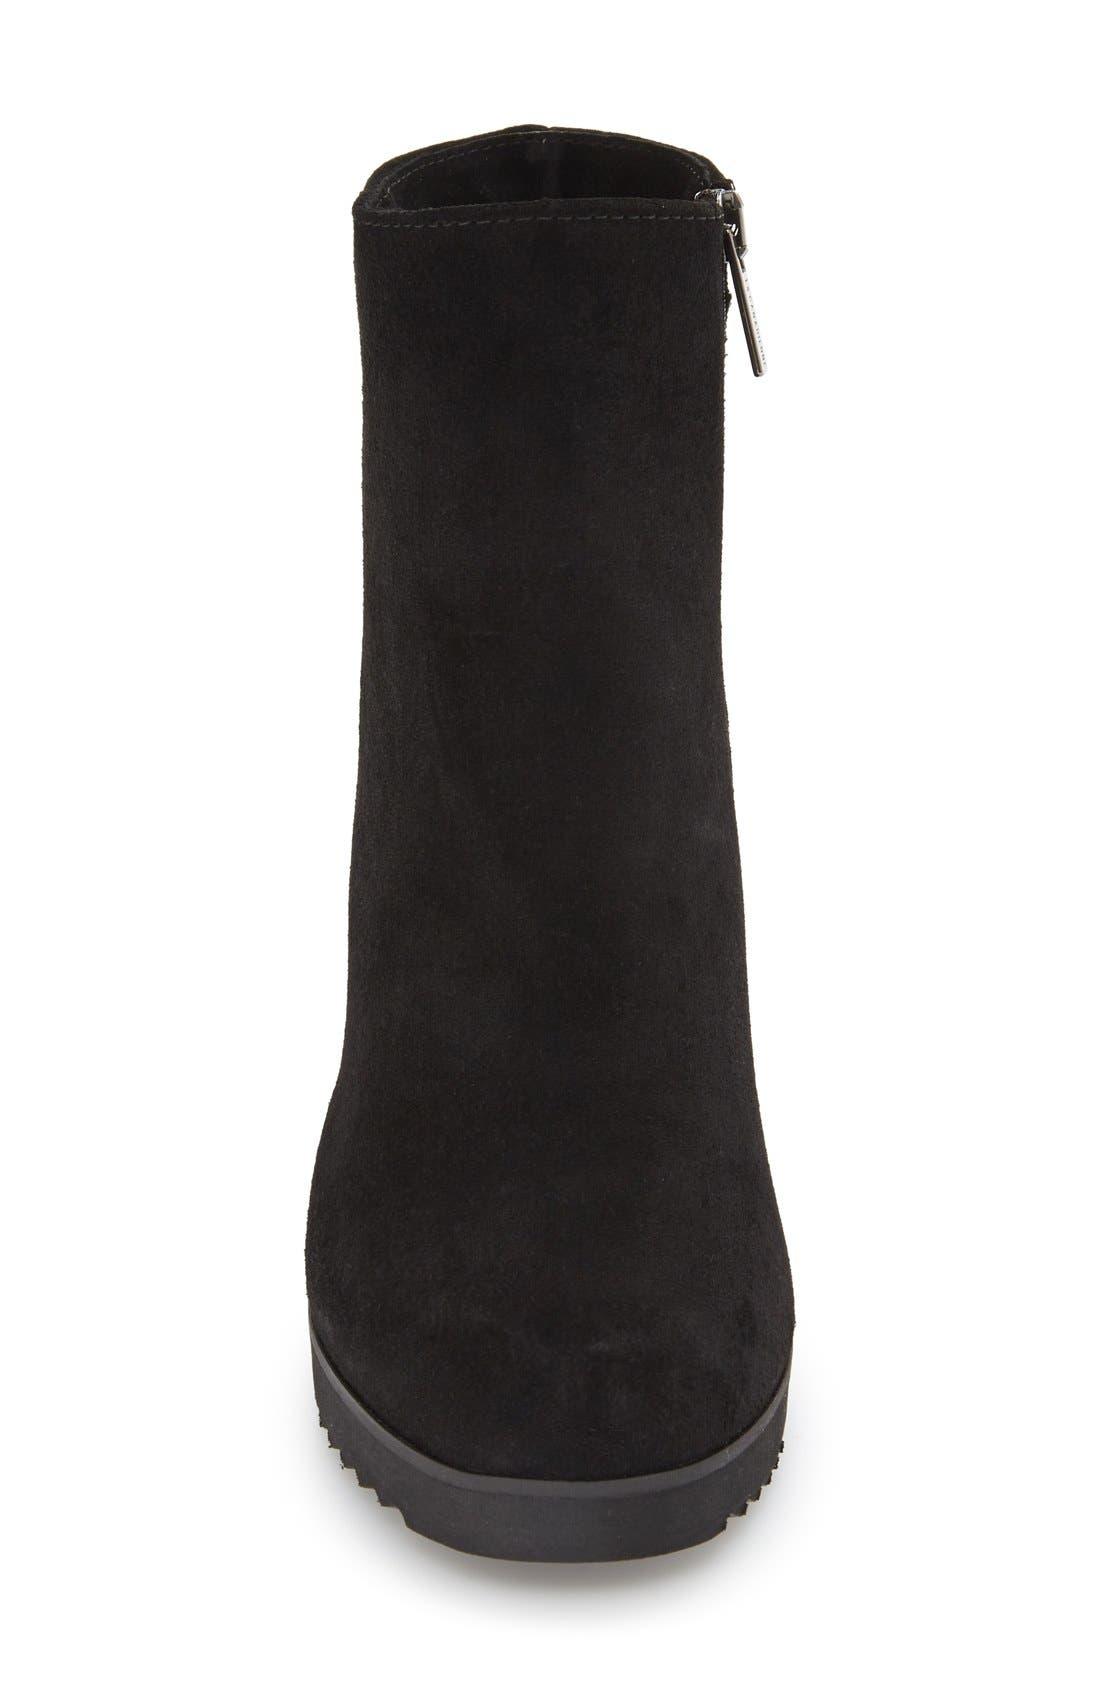 Alternate Image 3  - La Canadienne 'Myranda' Waterproof Block Heel Bootie (Women)